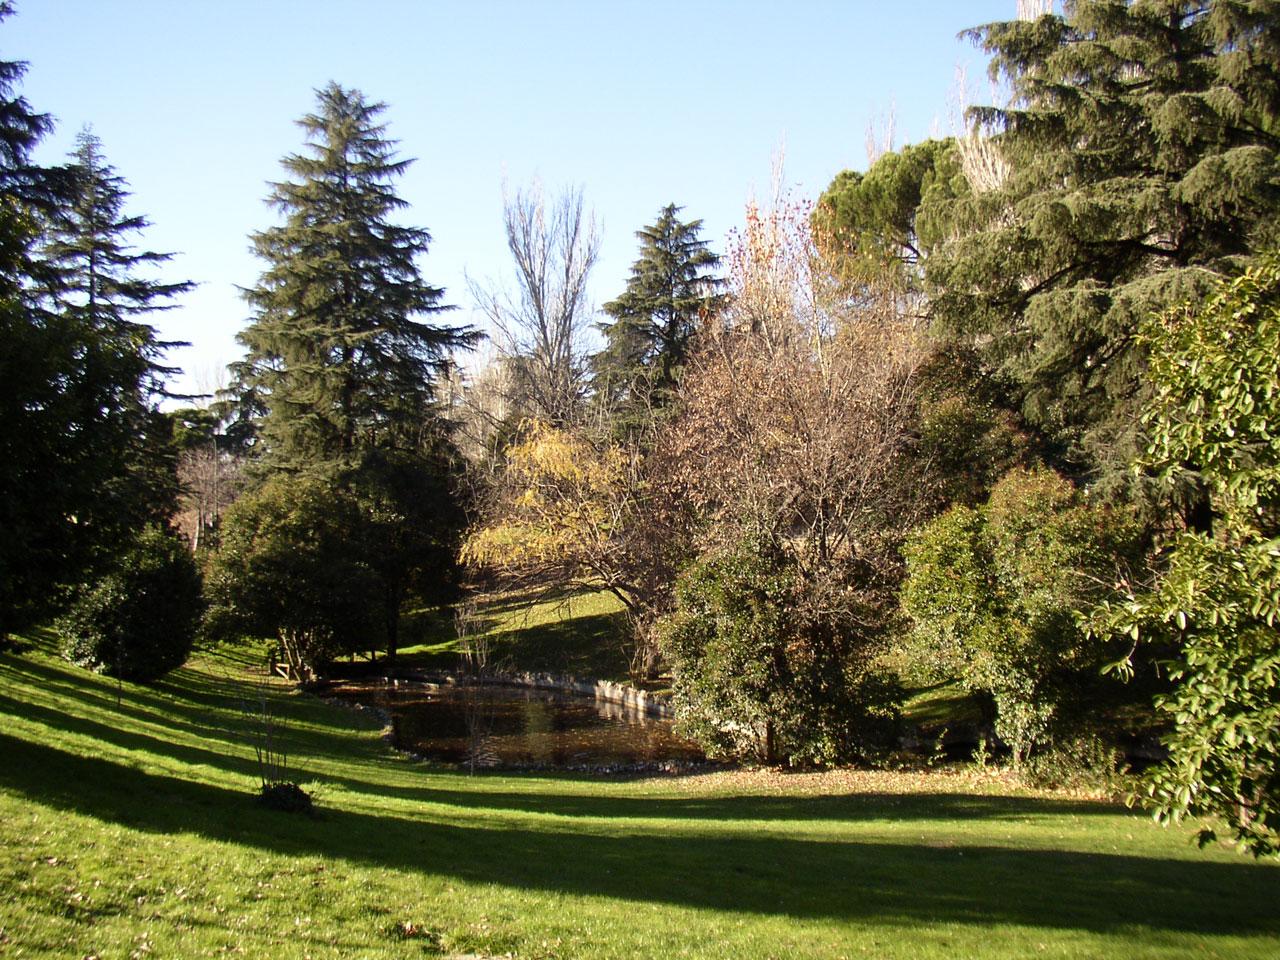 Ail Madrid Escuela De Espa Ol Parte Ii Parques De